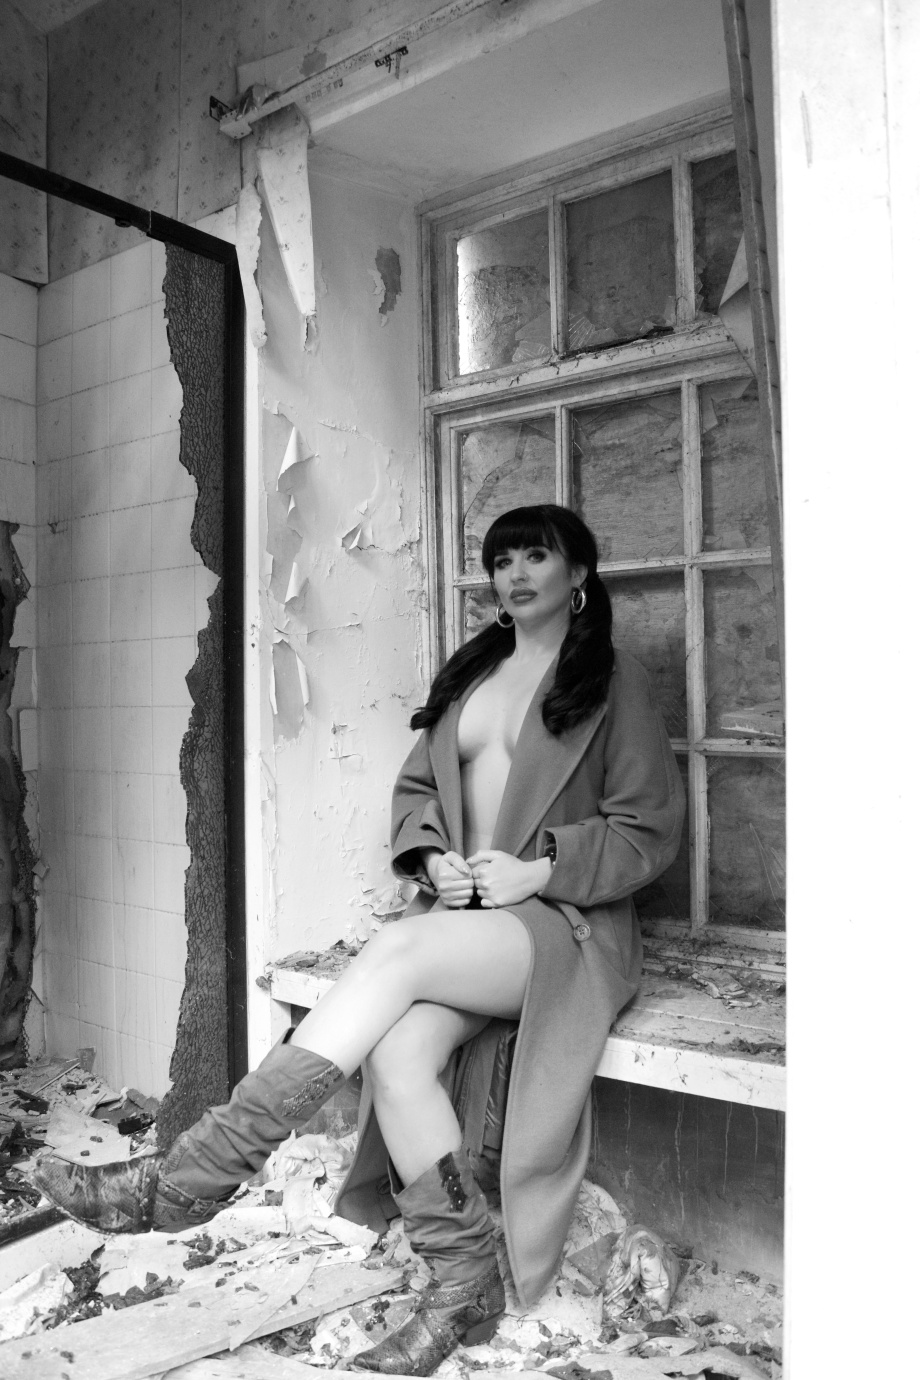 Midleton, Glamour, photoshoot, lingerie, sexy, abandoned house, alternative, tattoos, black and white